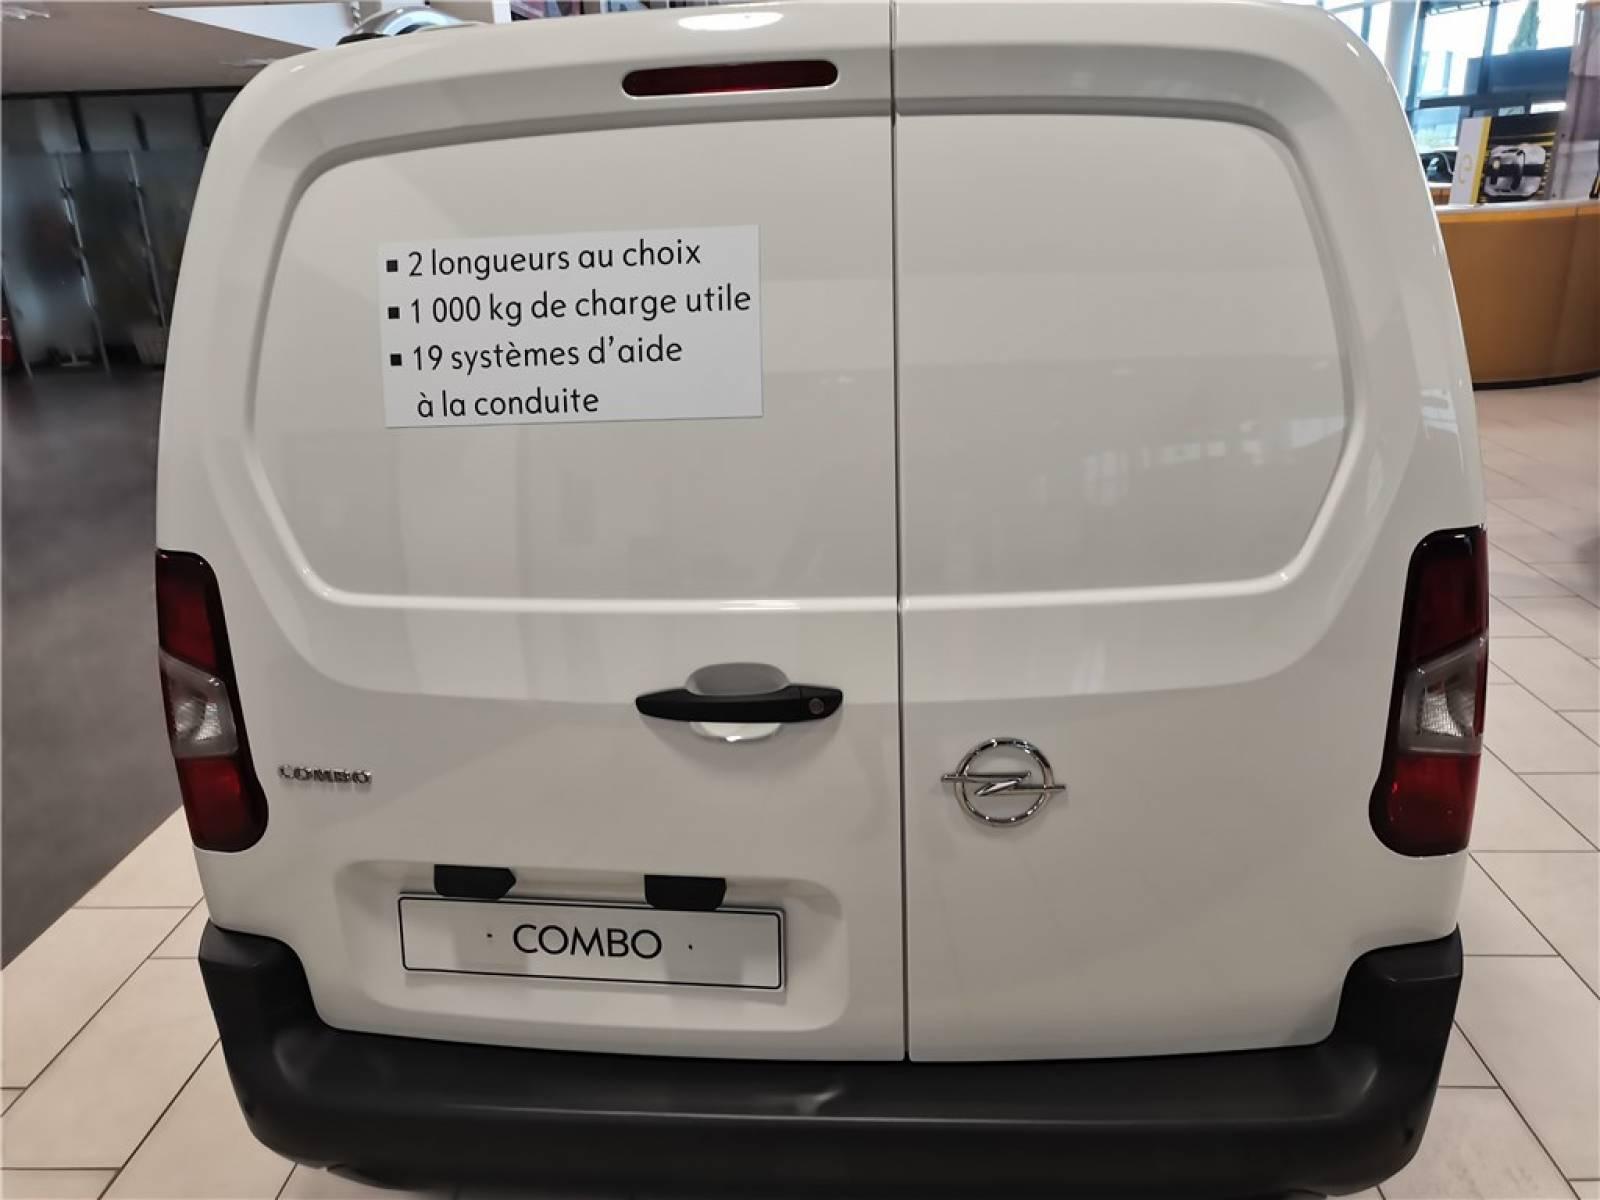 OPEL COMBO CARGO 1.5 100 CH L1H1 STANDARD - véhicule d'occasion - Groupe Guillet - Opel Magicauto - Chalon-sur-Saône - 71380 - Saint-Marcel - 18